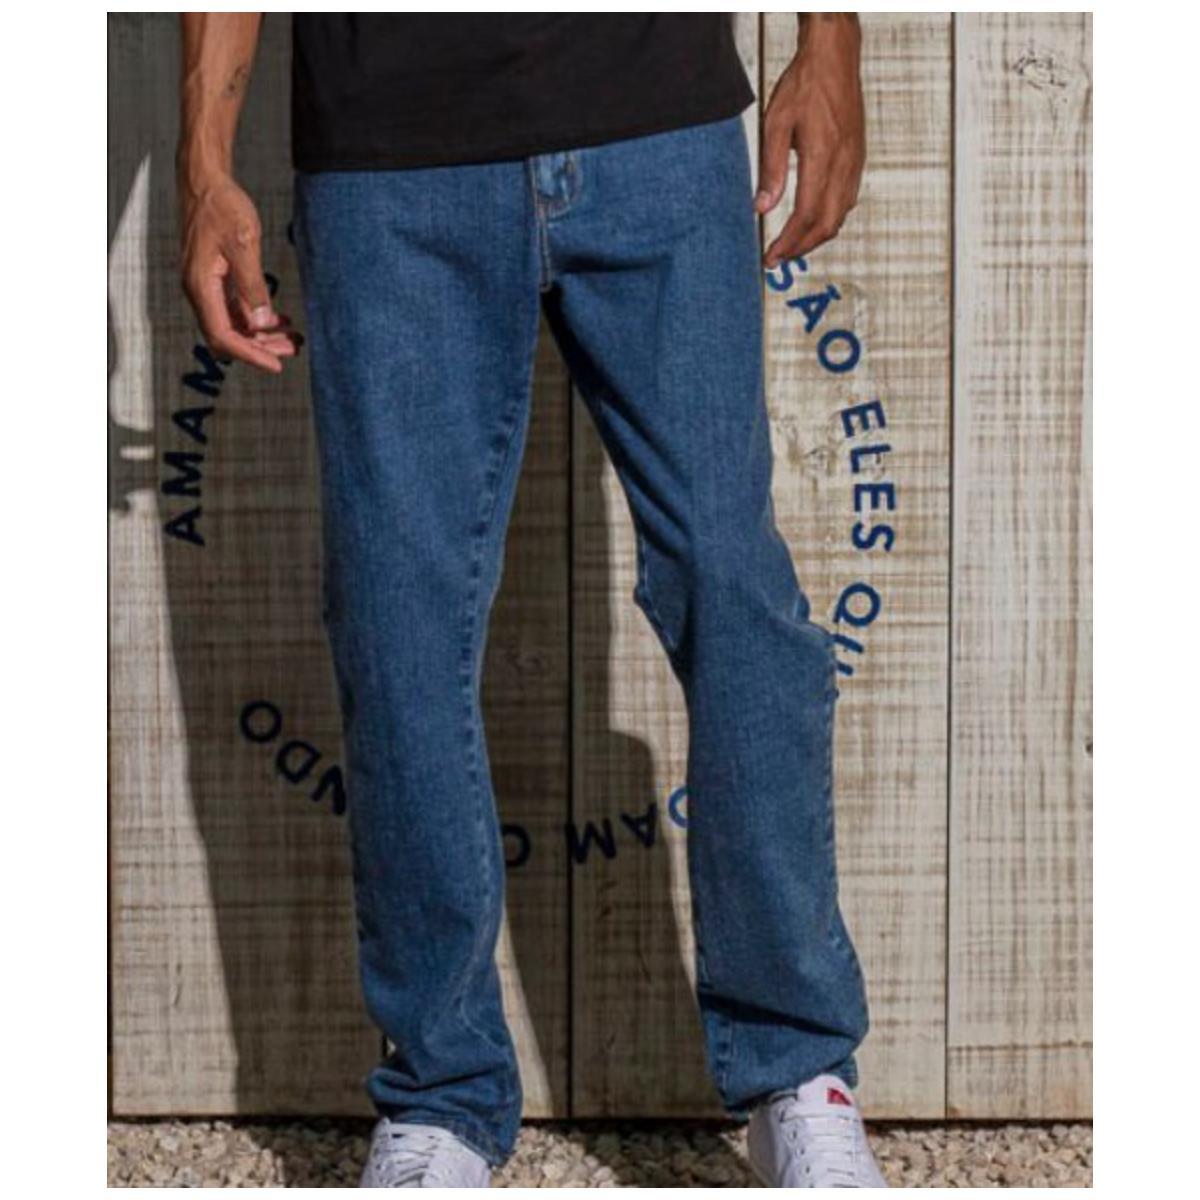 Calça Masculina Coca-cola Clothing 13202776  Jeans